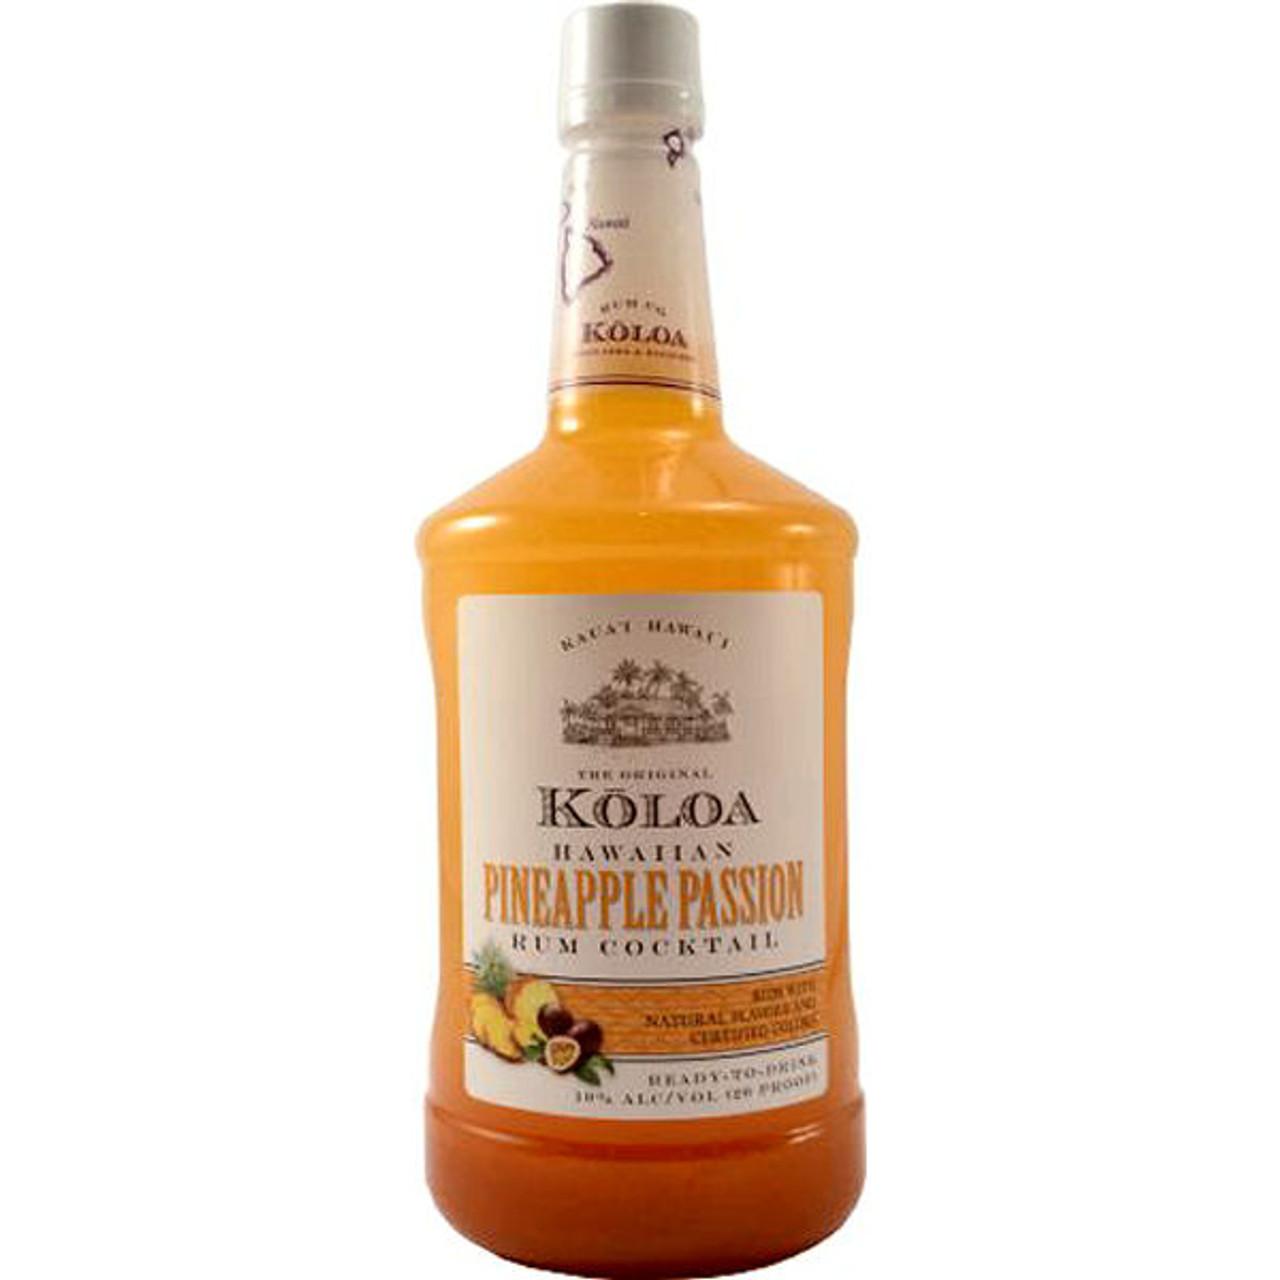 Koloa Hawaiian Pineapple Passion Rum Cocktail 1.75L